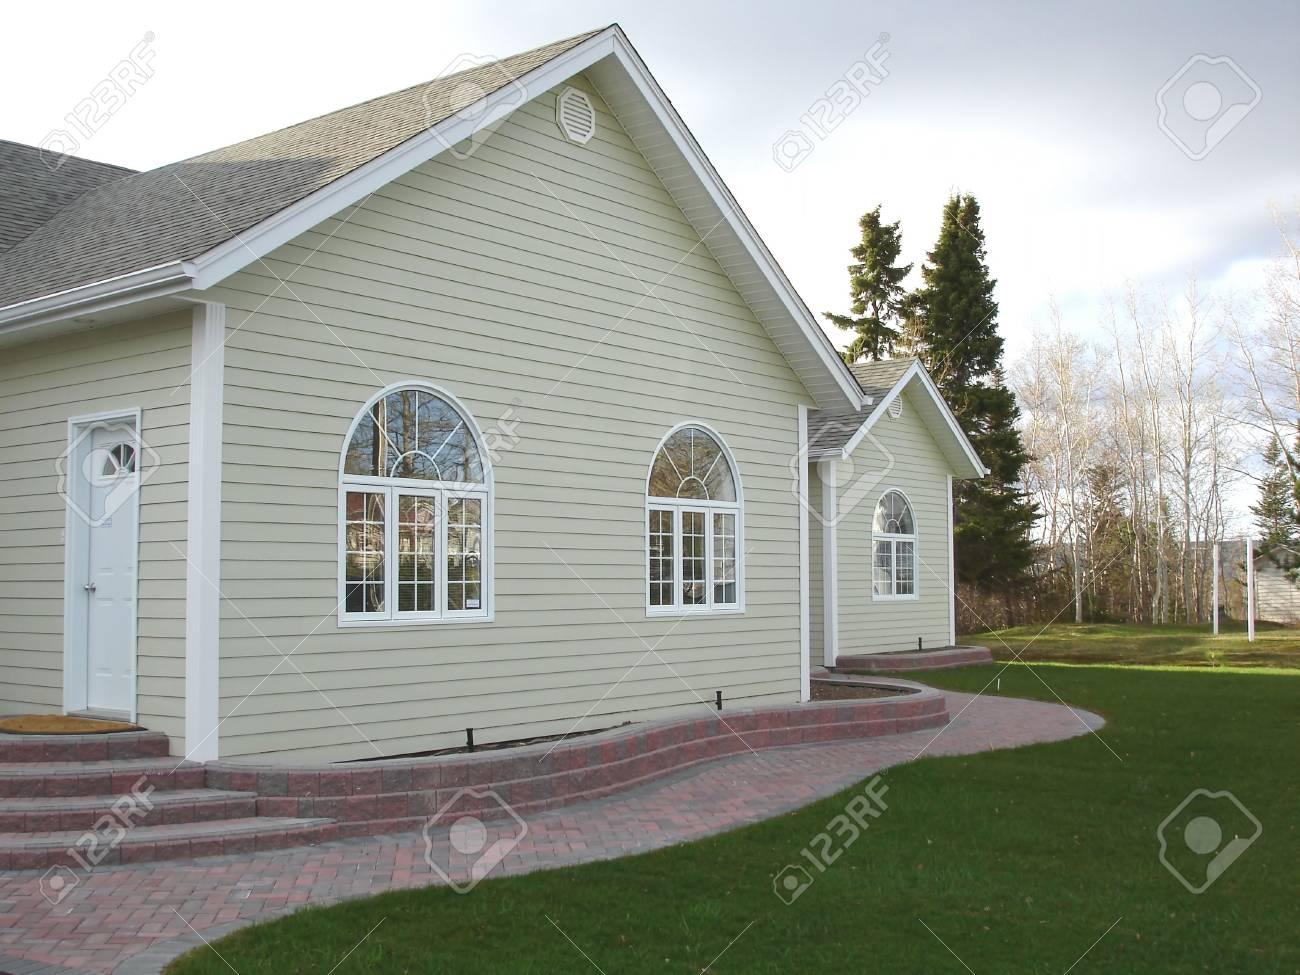 A Modern Home - 412736